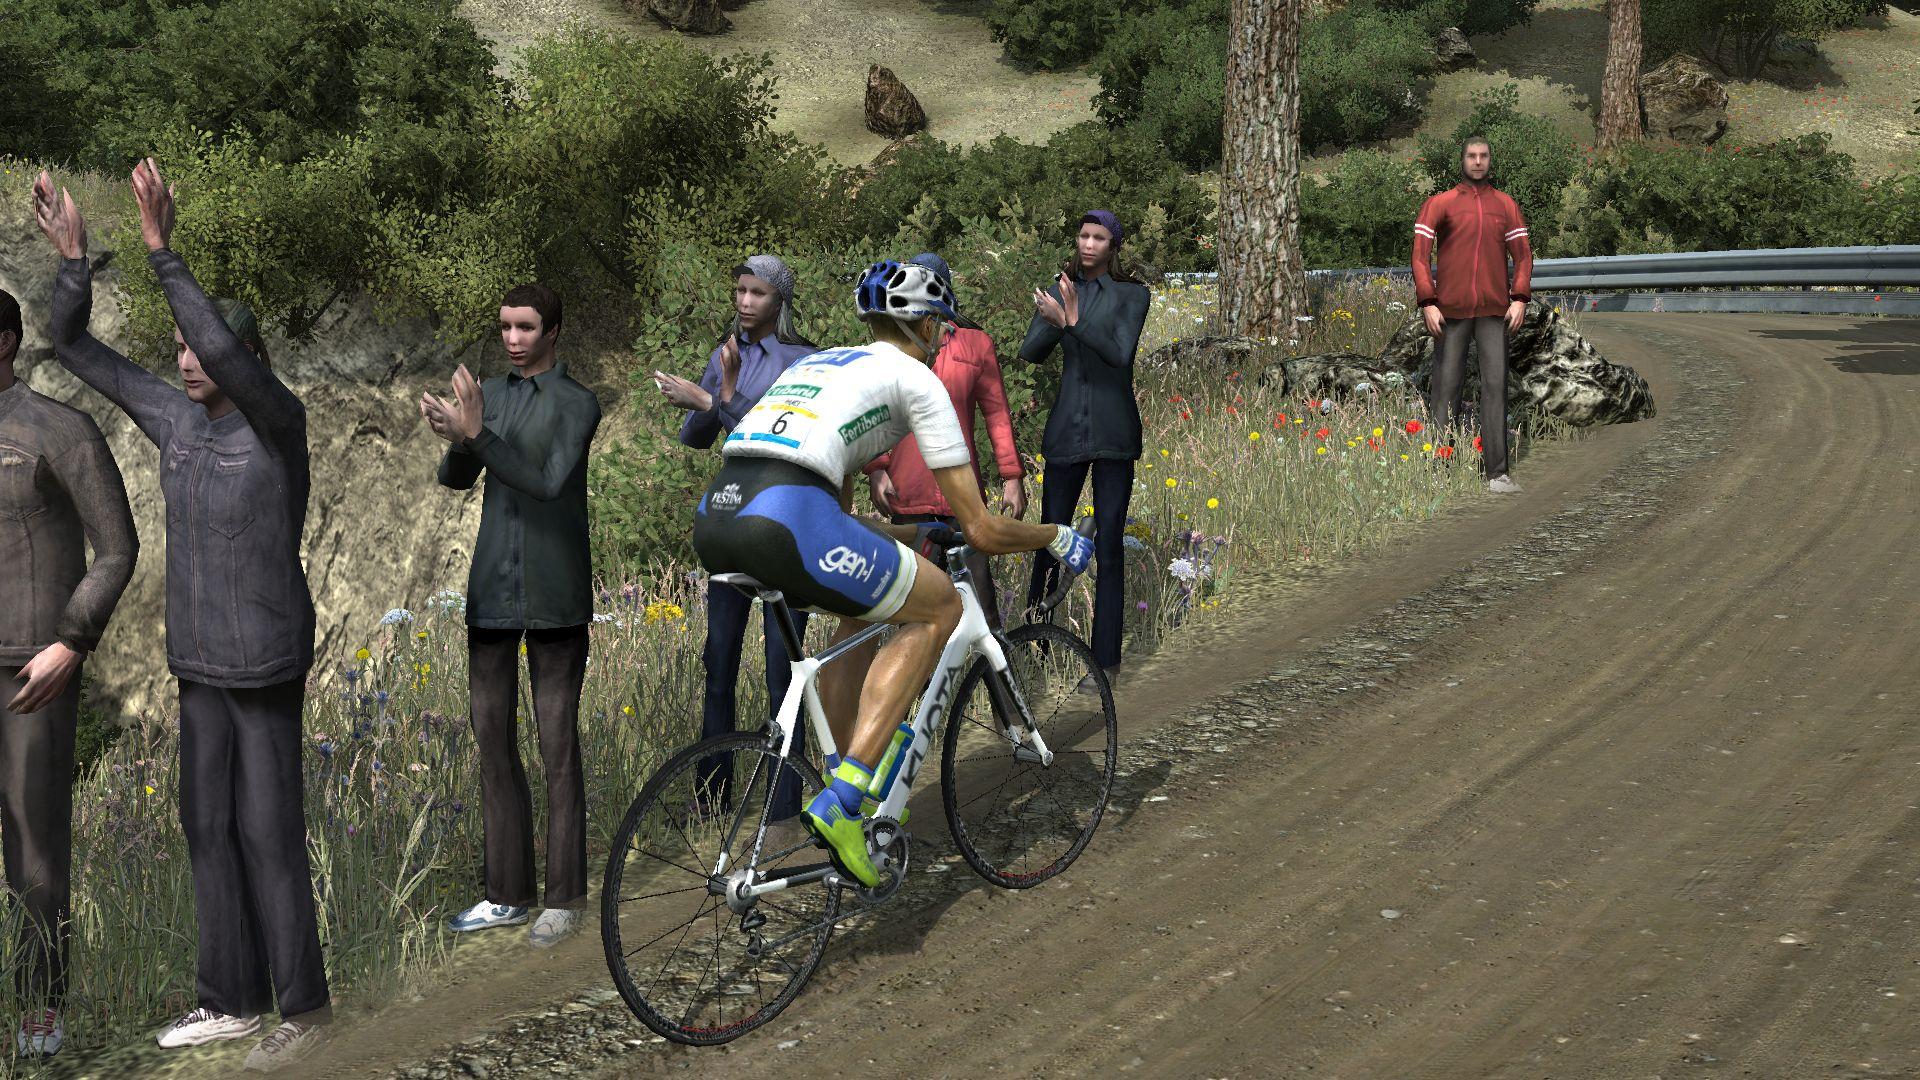 pcmdaily.com/images/mg/2016/Races/PT/Vuelta/mg2016_vuelta_20_PCM1171.jpg